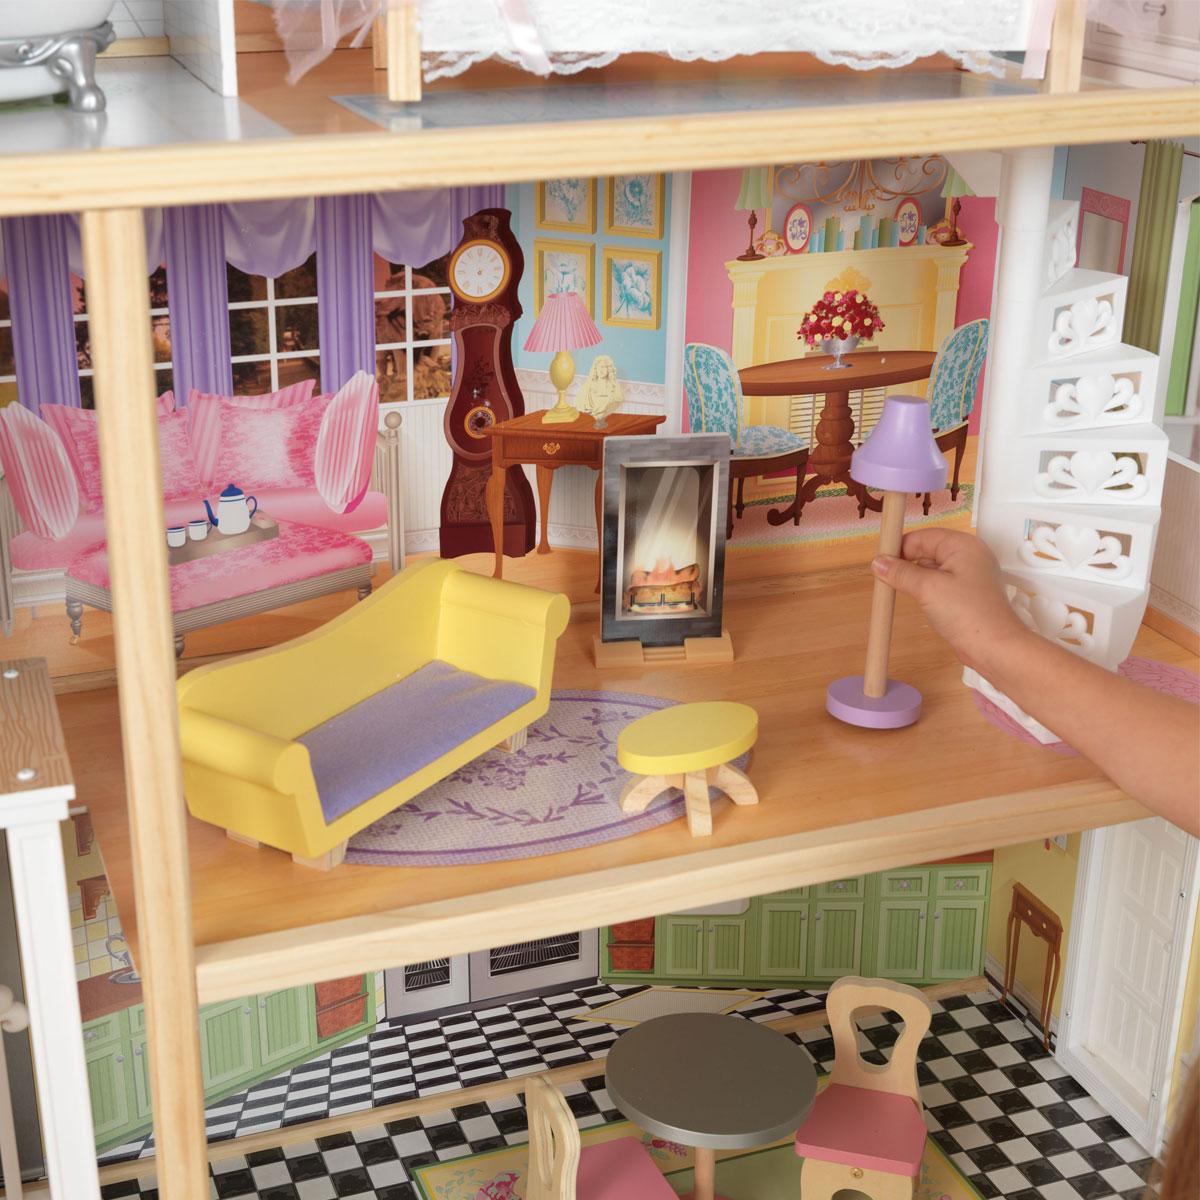 Kidkraft puppenhaus kaylee 65251 pirum for Barbiehuis meubels